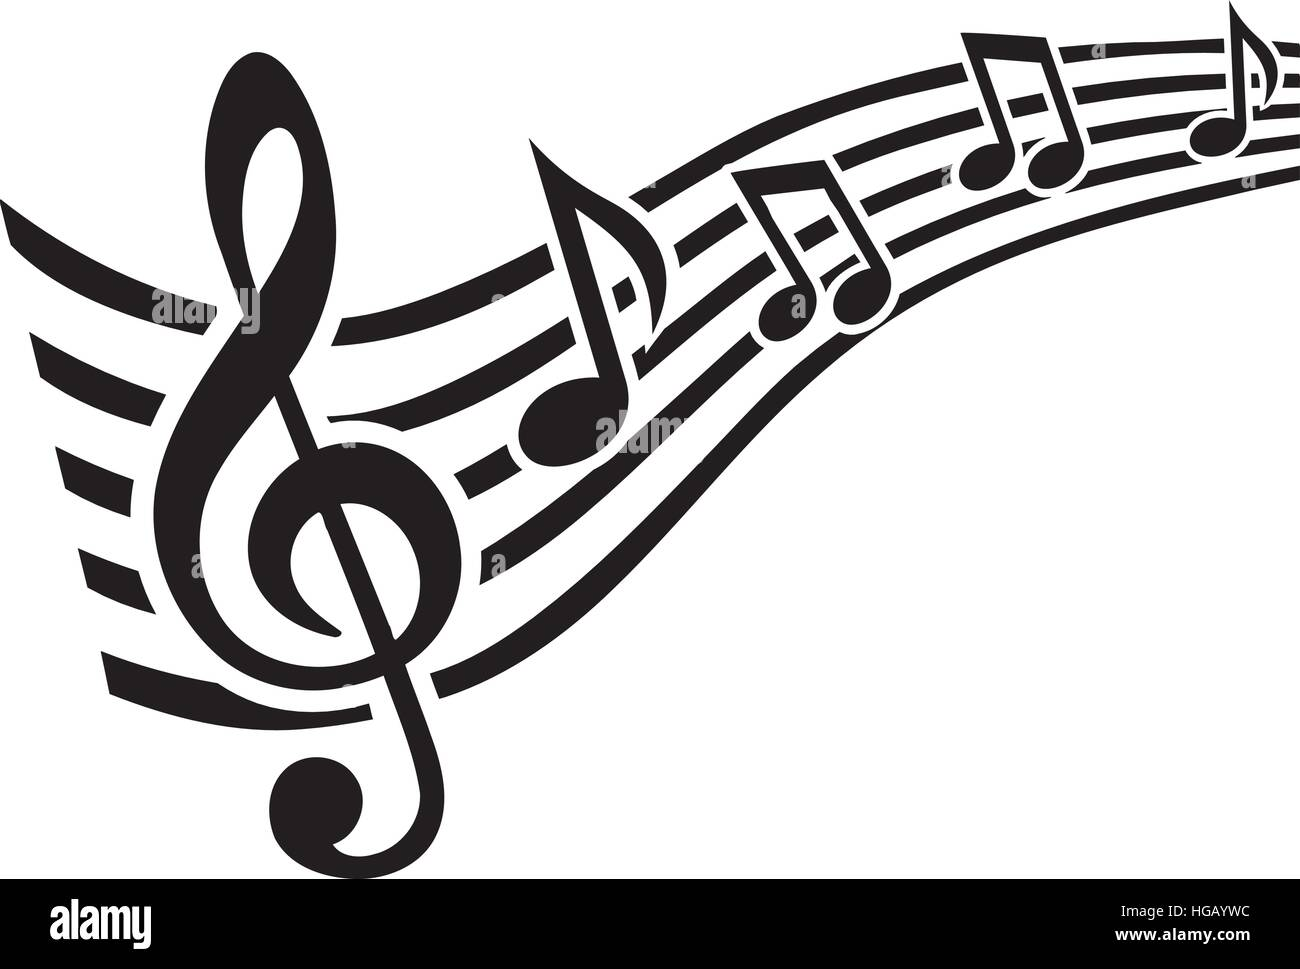 music note line swirl stock vector art illustration vector image rh alamy com Music Swirl Singing Notes